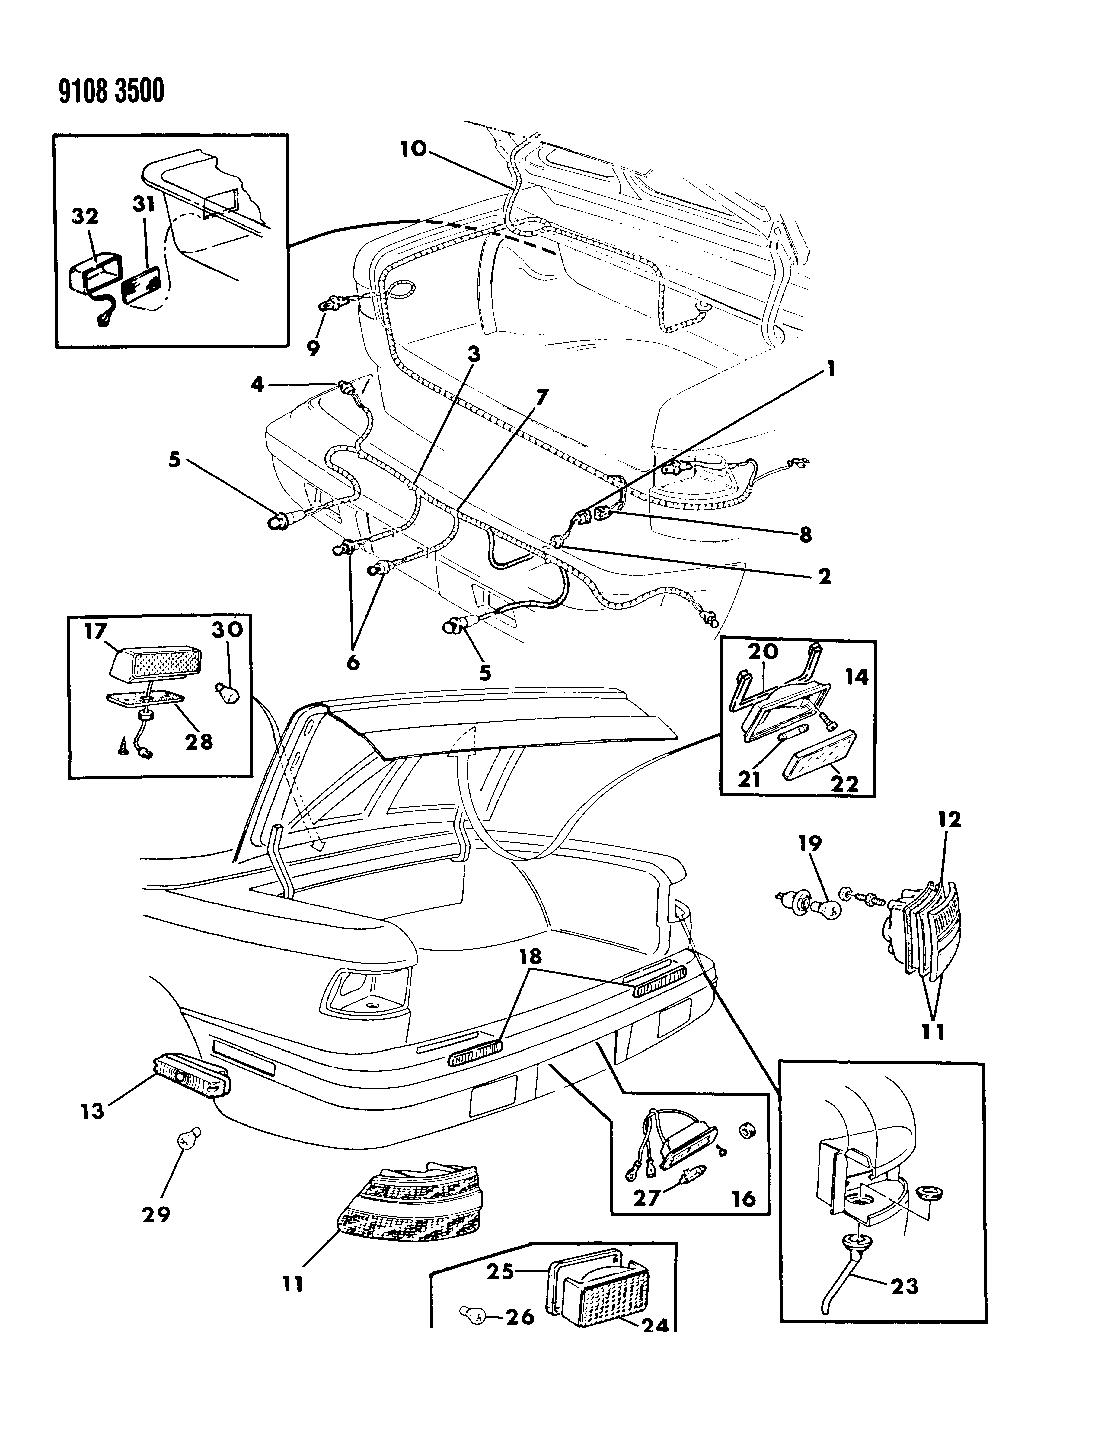 Chrysler Tc By Maserati Electrical Diagrams • Wiring